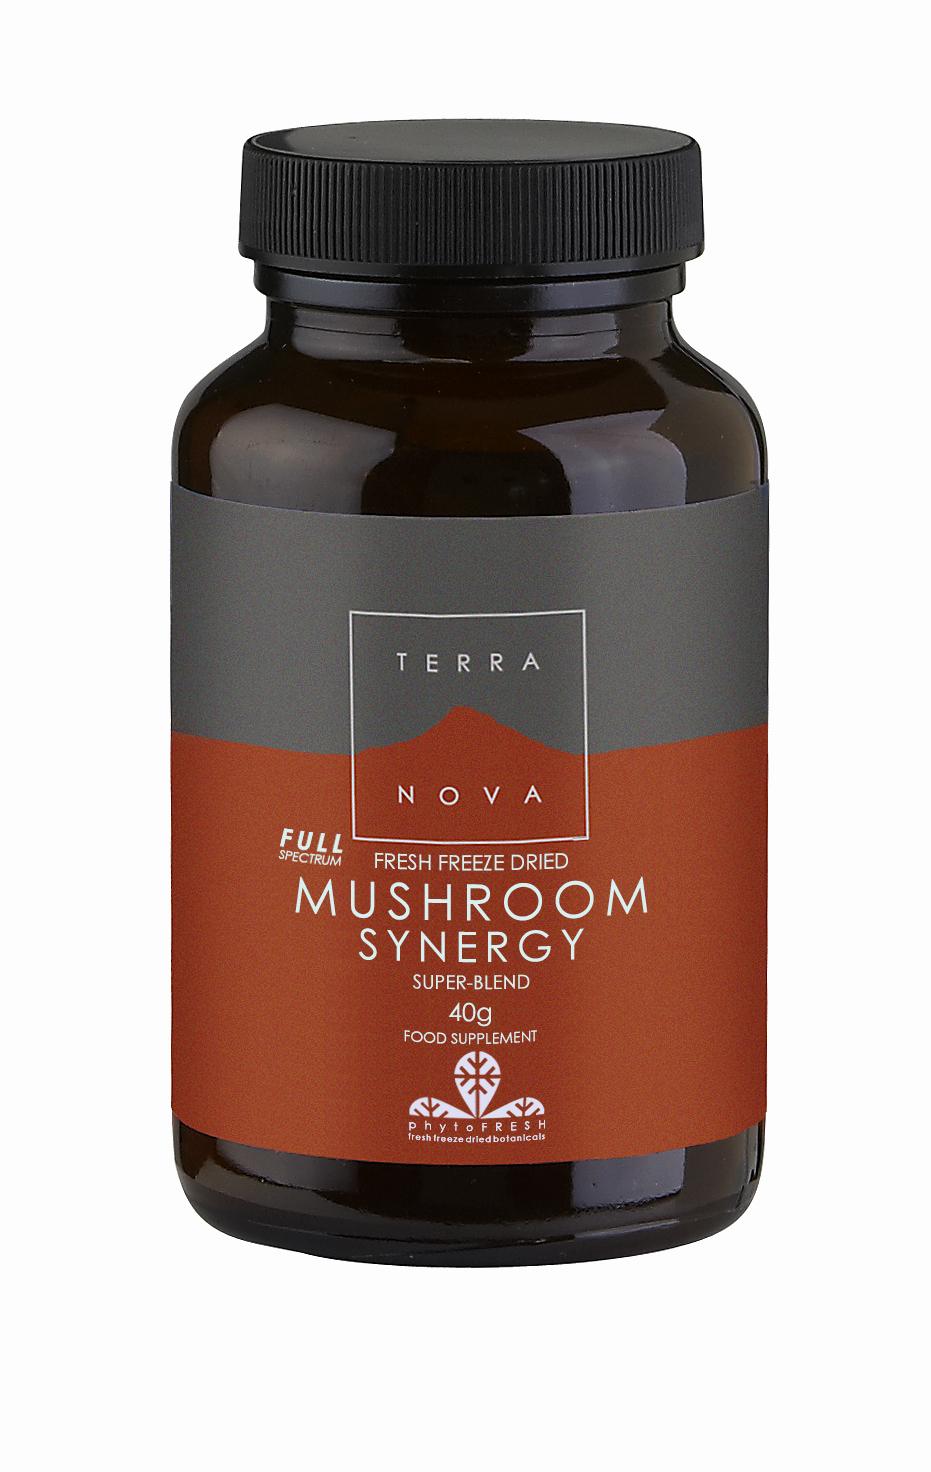 Mushroom Synergy Super-Blend Powder 40g